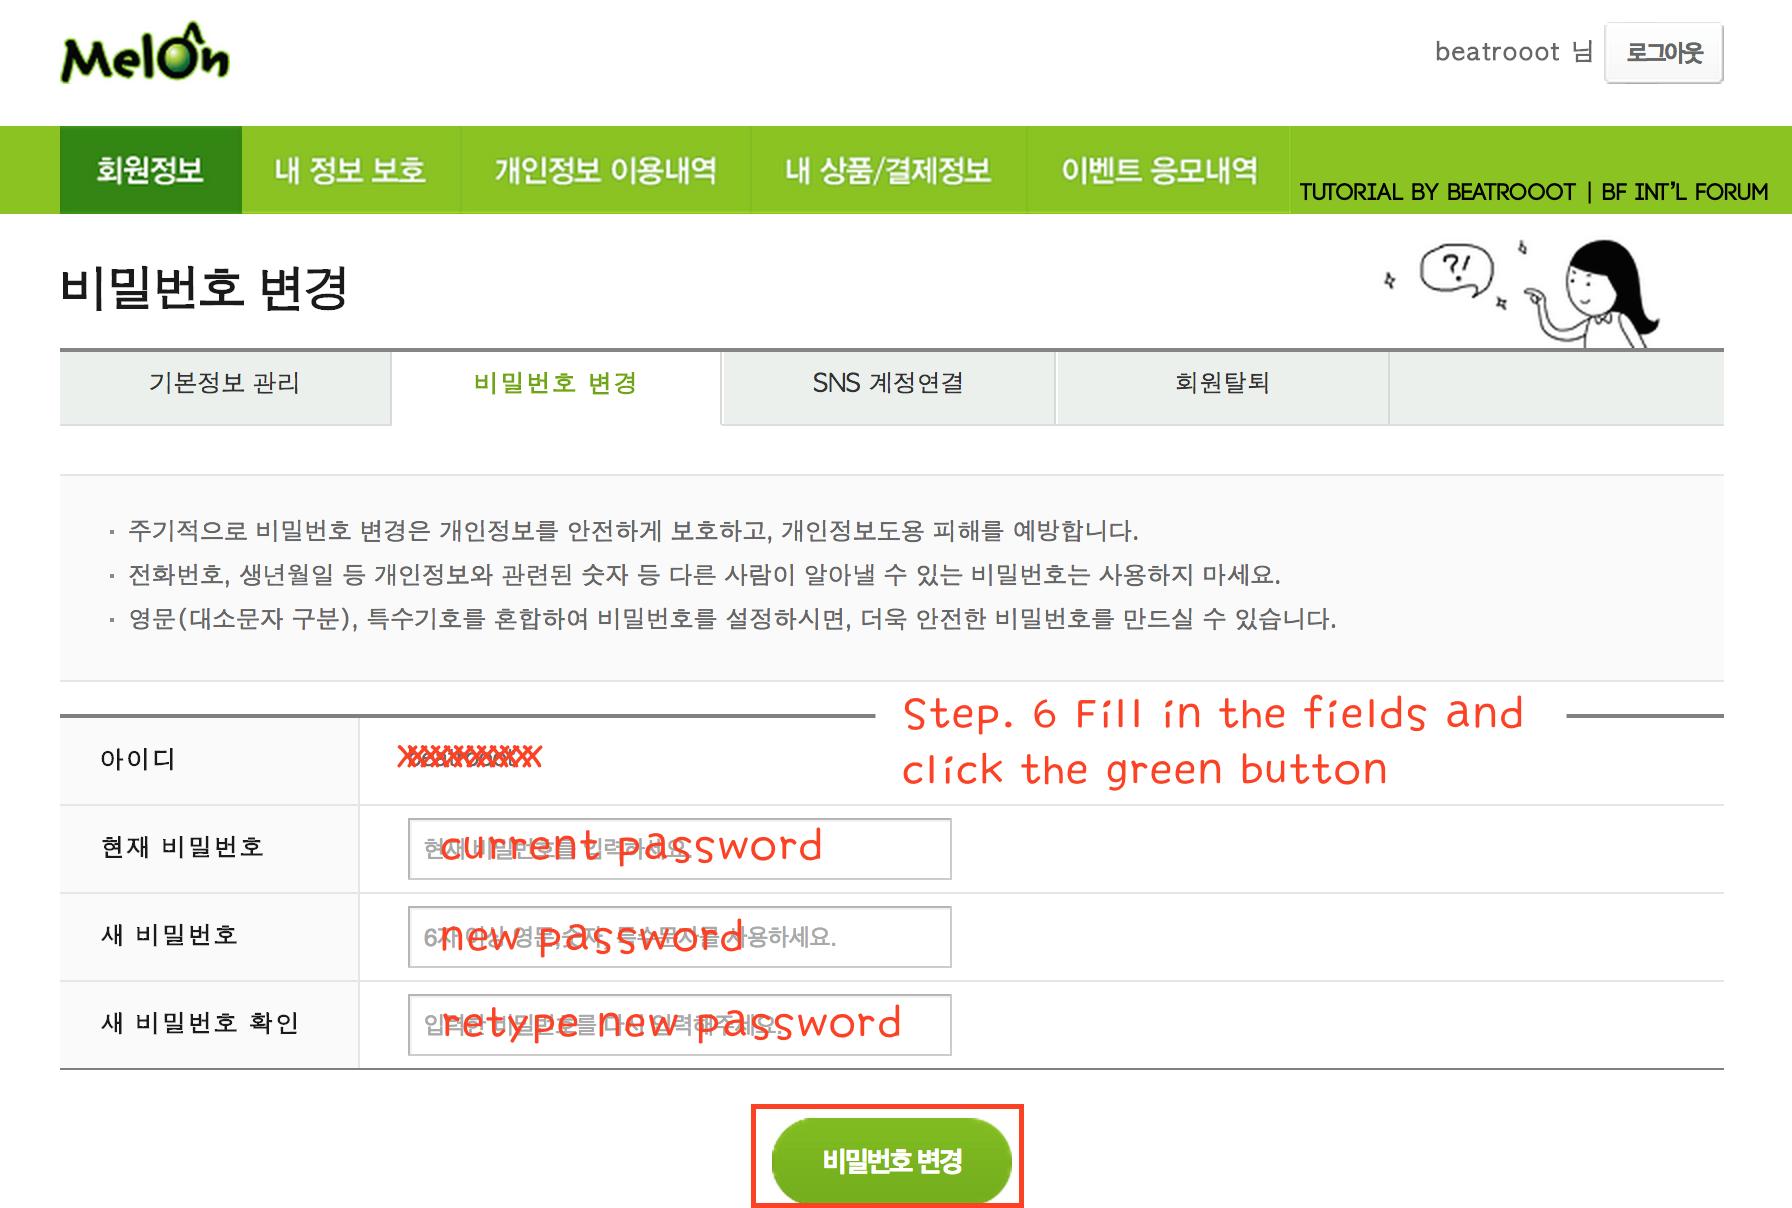 screen_shot_2014-09-30_at_12.20.32_pm.pn